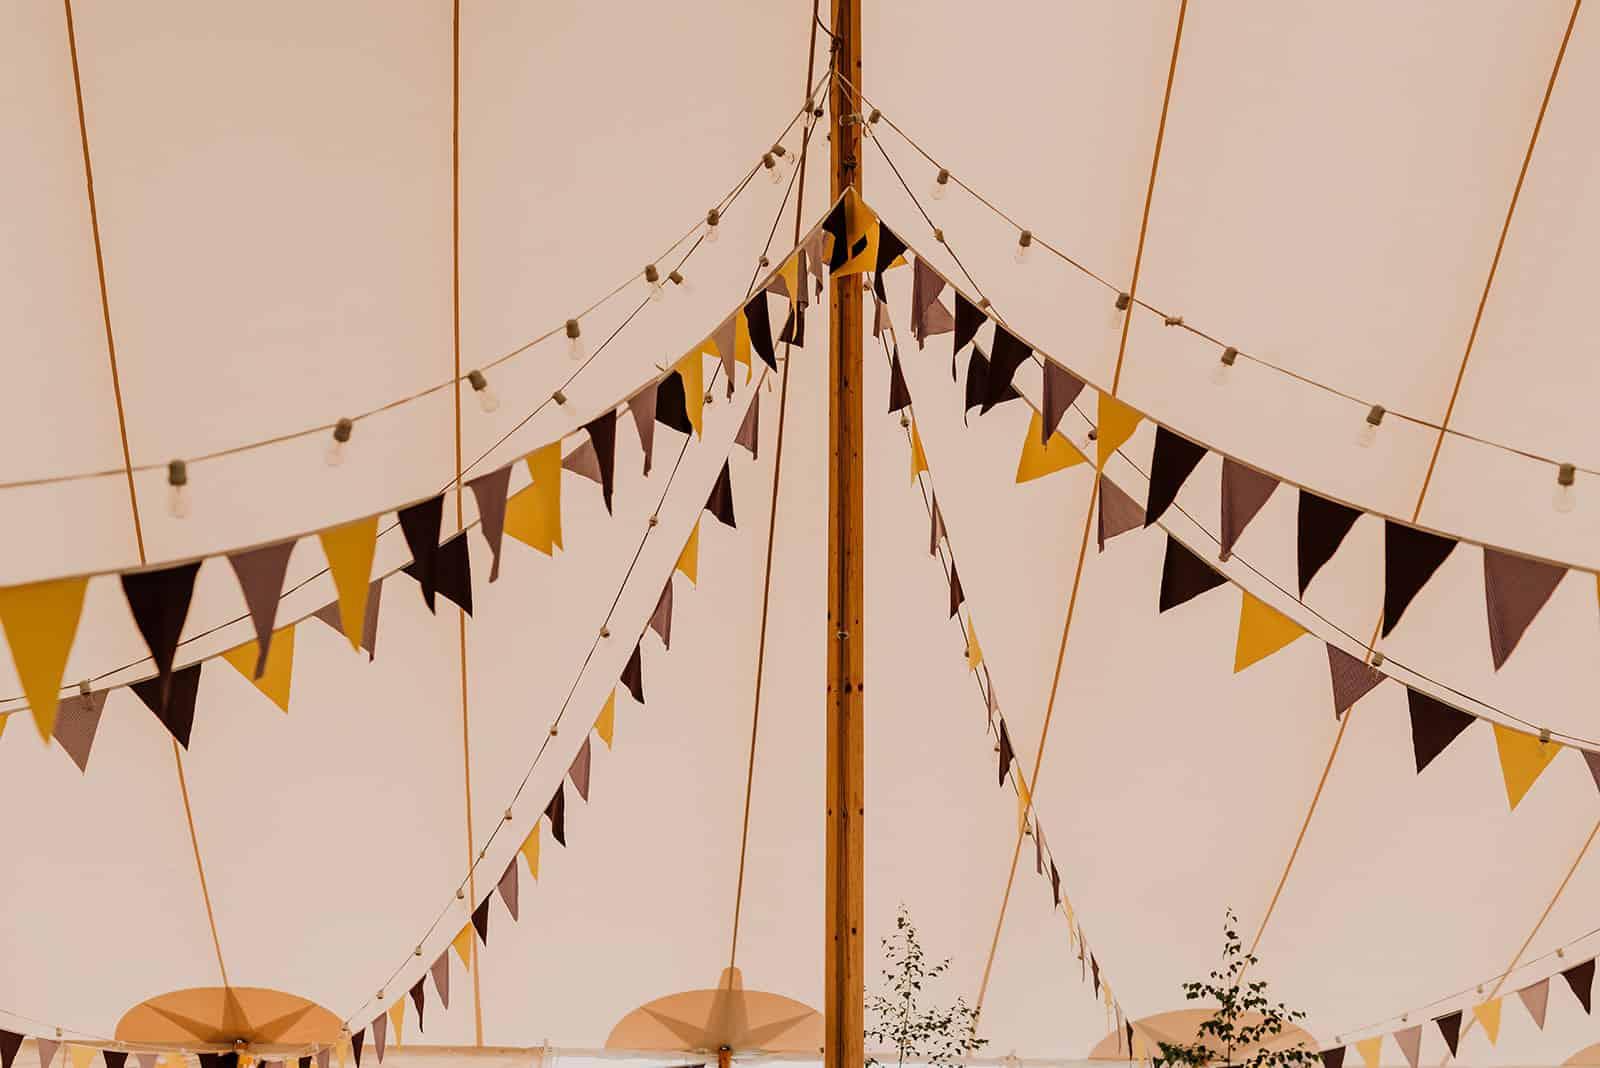 newdowns-farm-wedding-marquee-sperry-tents-sw-tom-peter-0008